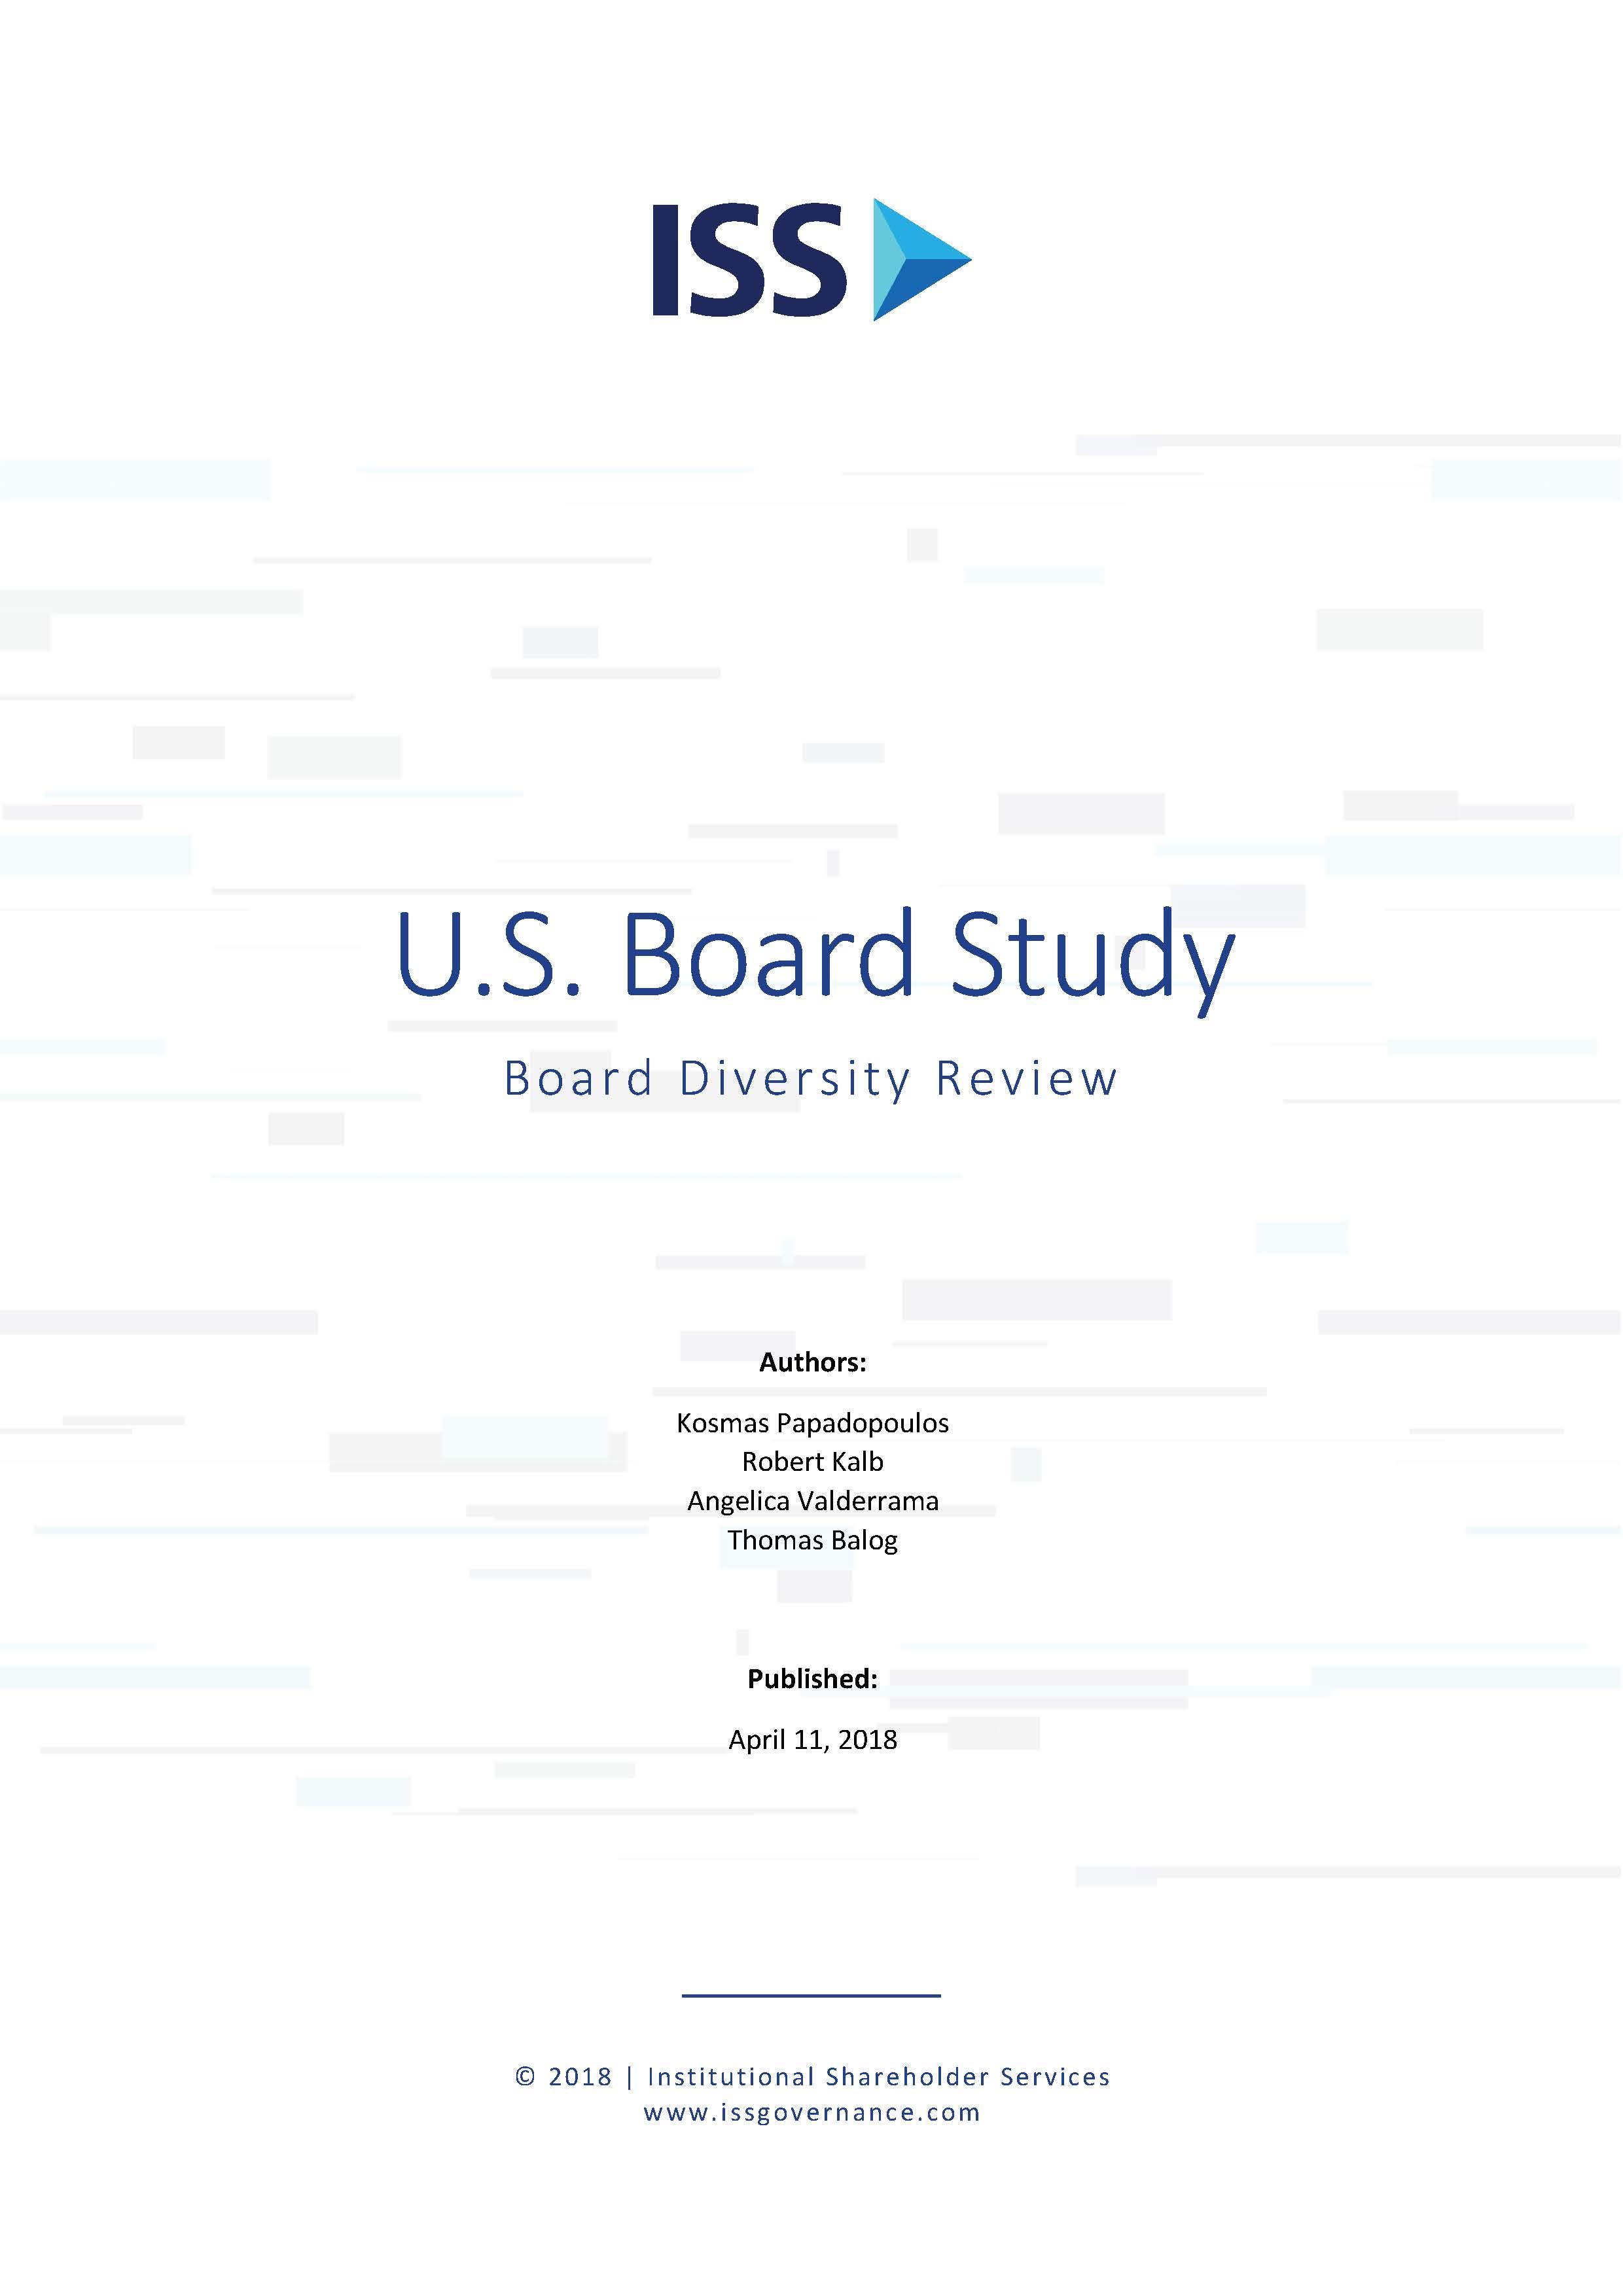 u.s.-board-study-diversity